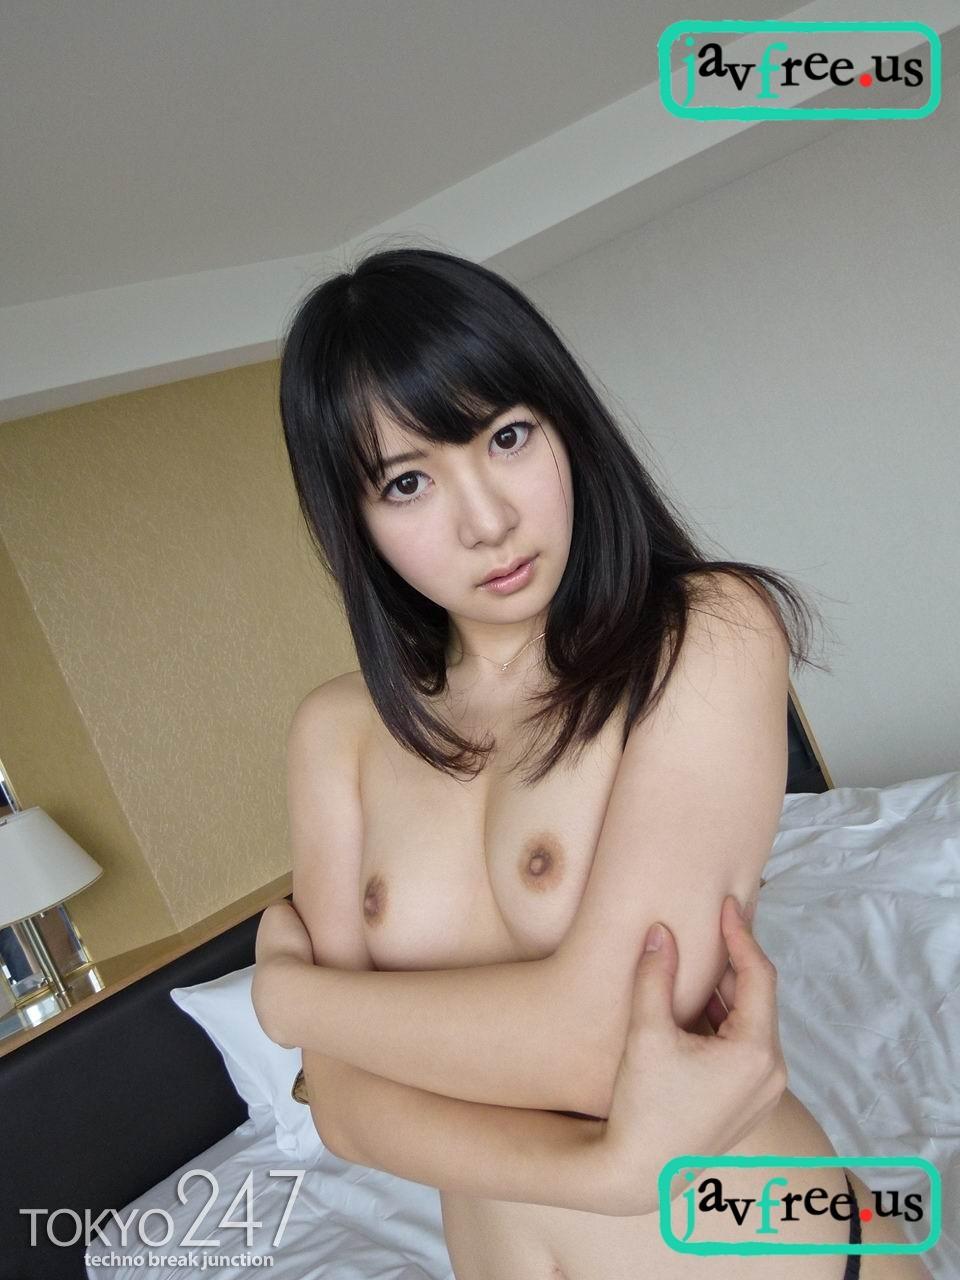 Tokyo 247 368 hitomi 藤原ひとみ 藤原ひとみ Tokyo 247